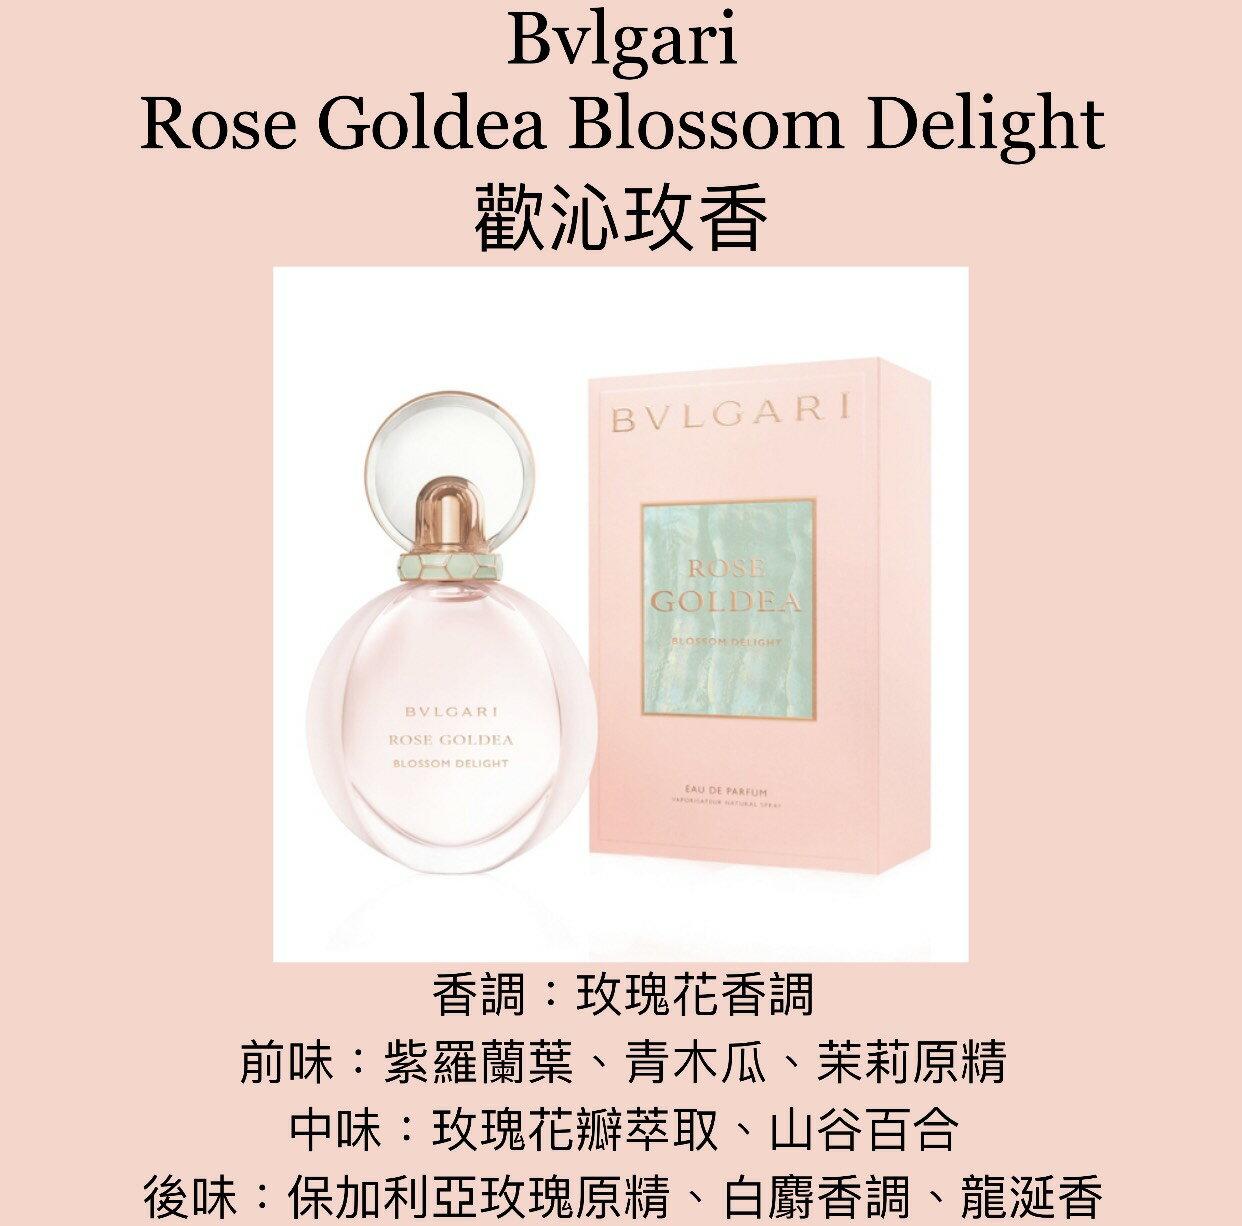 【香舍】Bvlgari Rose Goldea Blossom Delight 寶格麗 歡沁玫香 女性淡香精 50ML/75ML